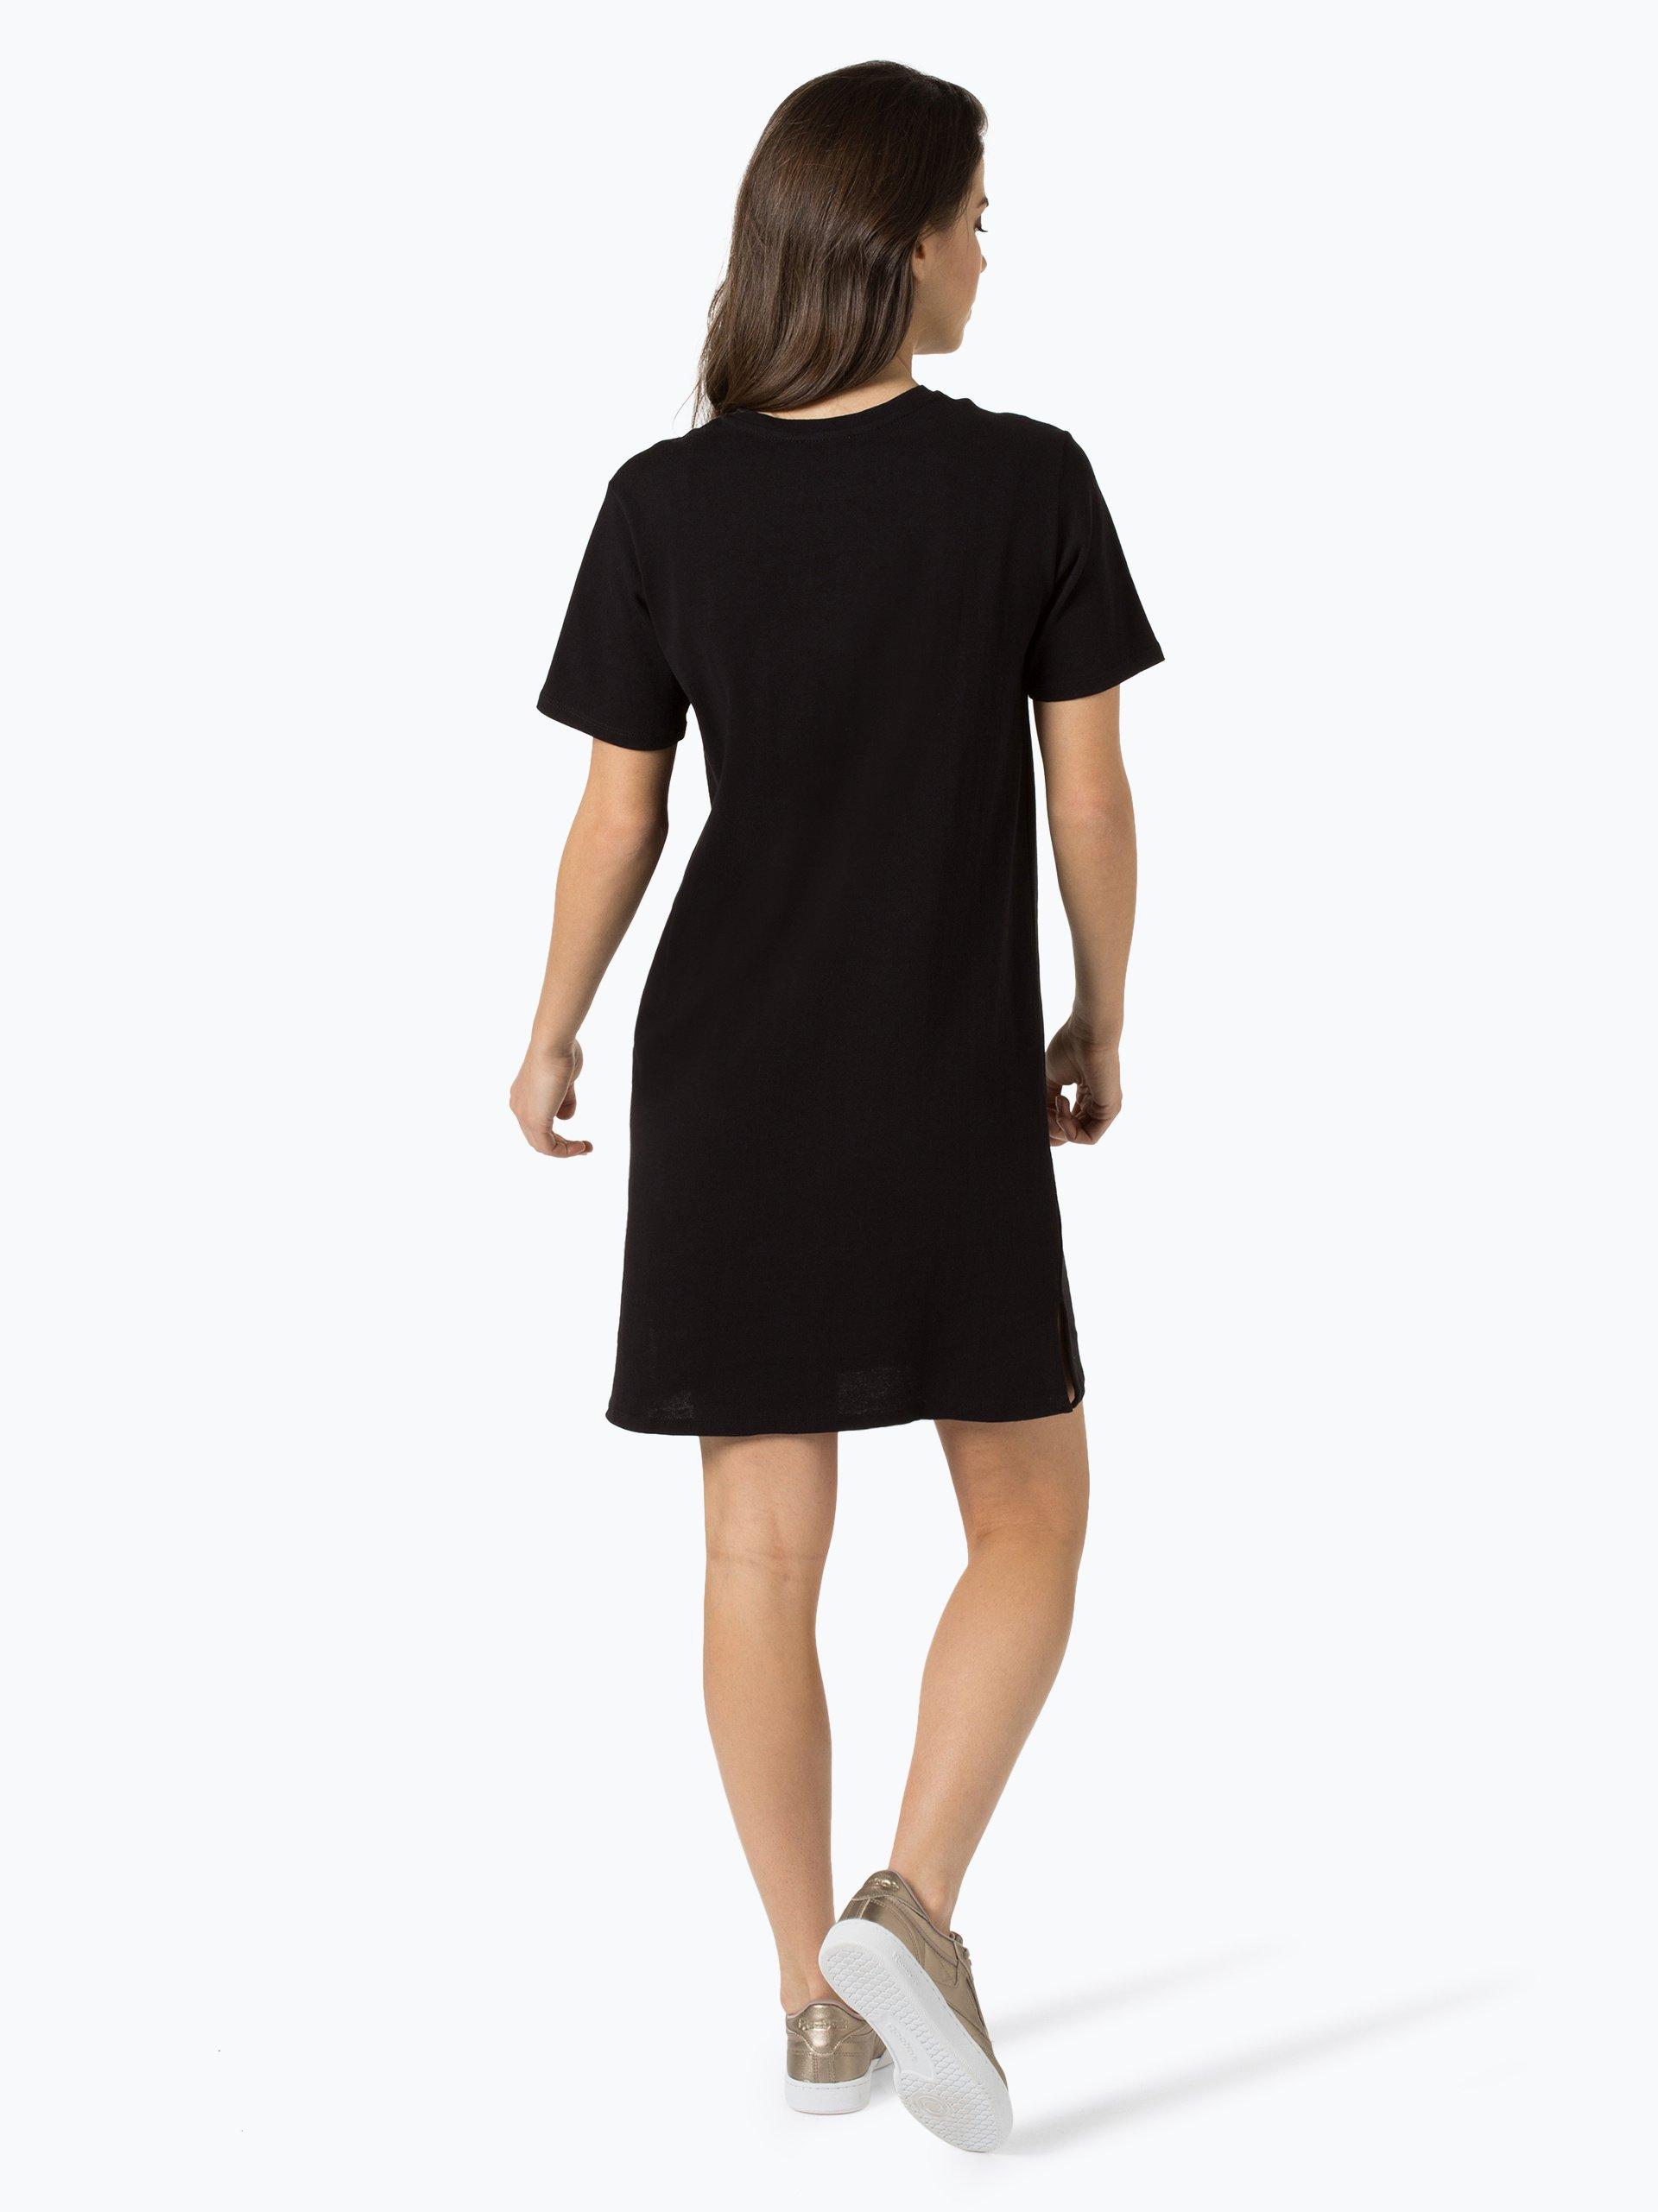 calvin klein jeans damen kleid schwarz gemustert online. Black Bedroom Furniture Sets. Home Design Ideas